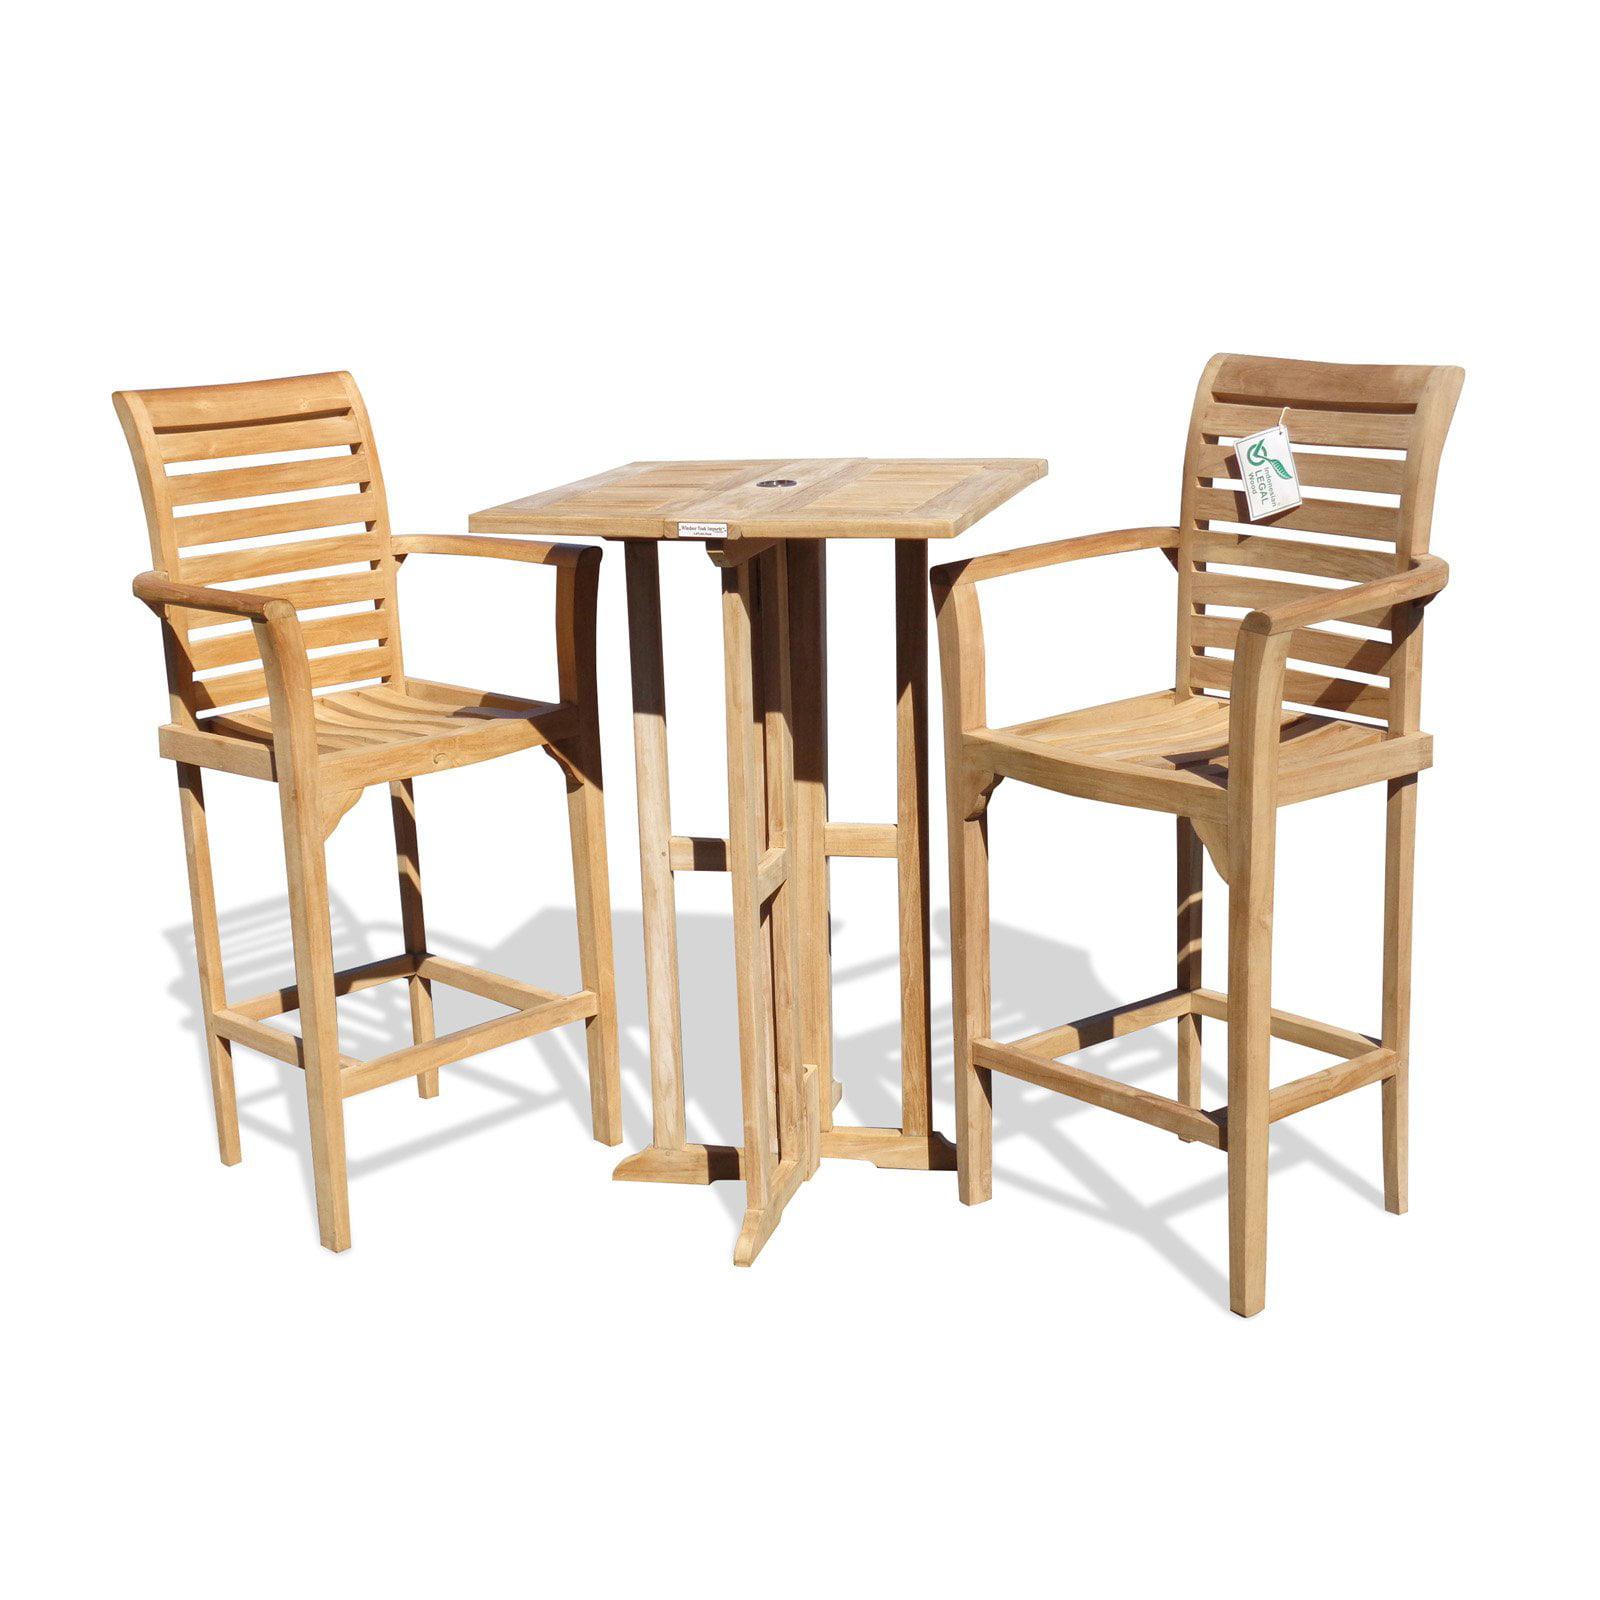 Windsor Teak Furniture Bimini Counter Height Teak 3 Piece Dining Room Set by Windsor Teak Furniture